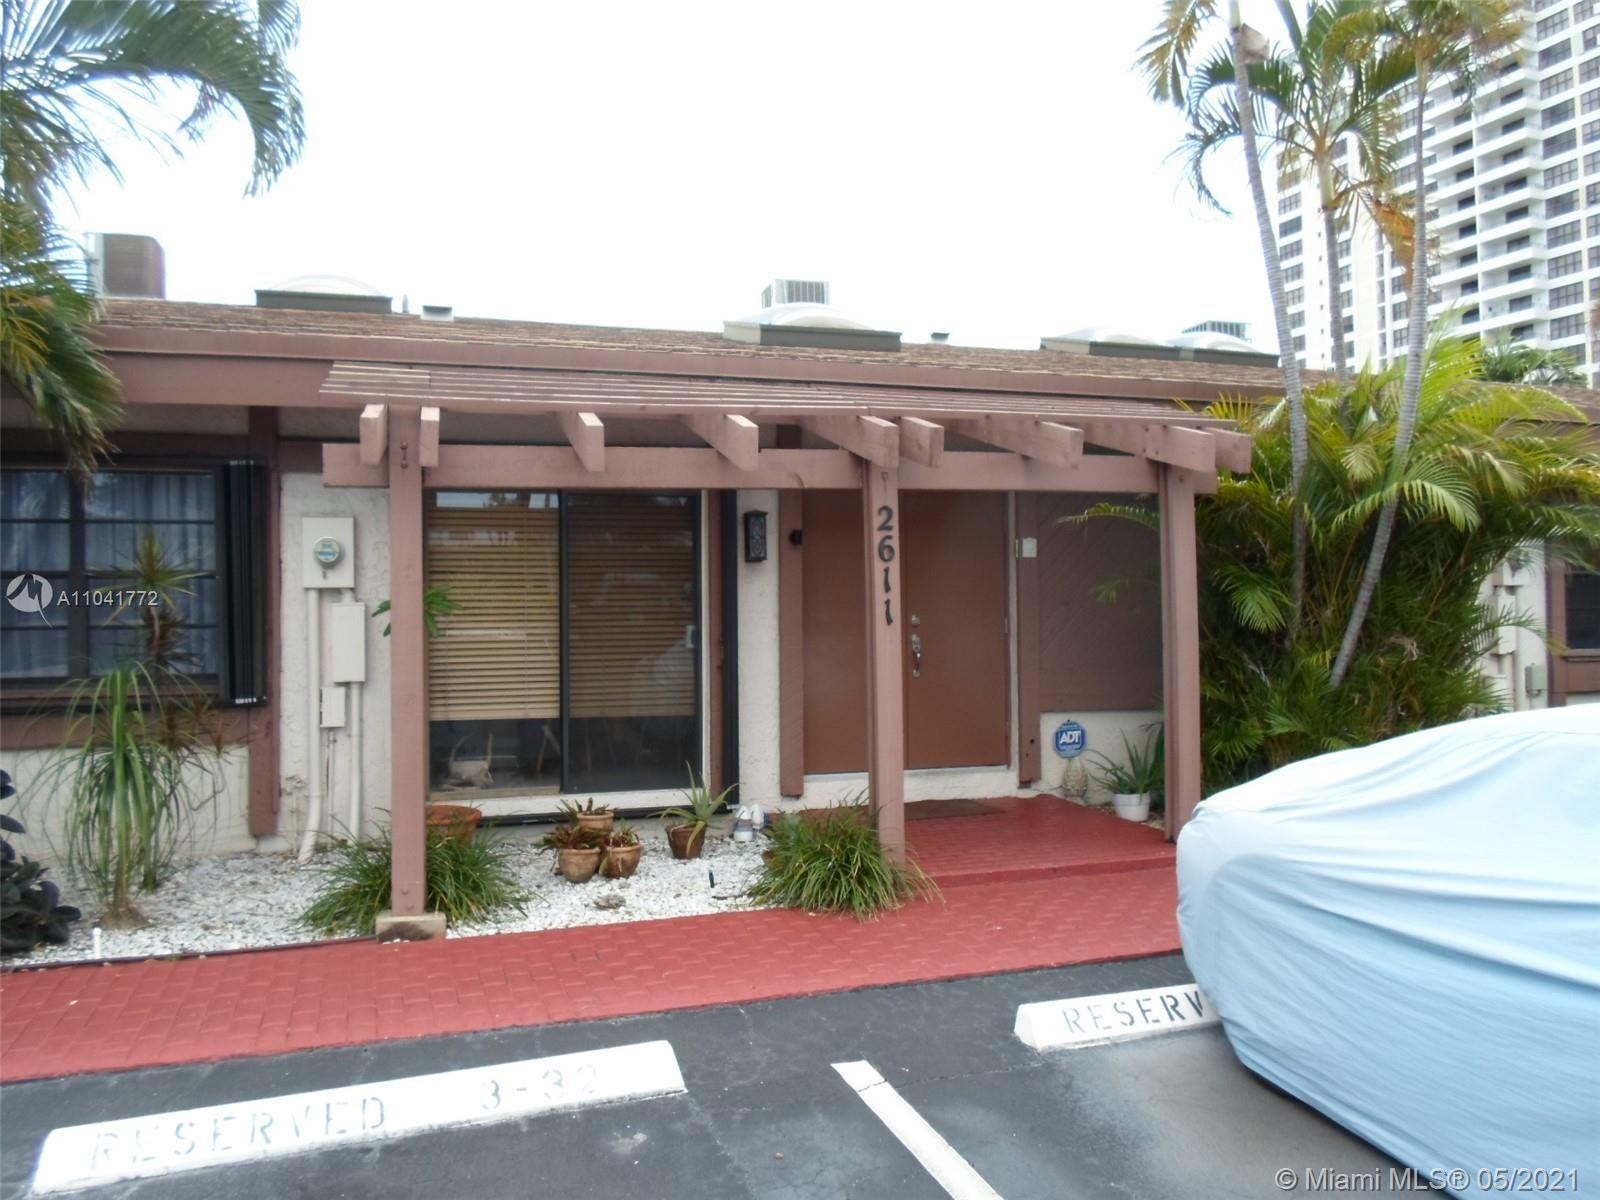 Photo of 2611 S Parkview Dr, Hallandale Beach, FL 33009 (MLS # A11041772)